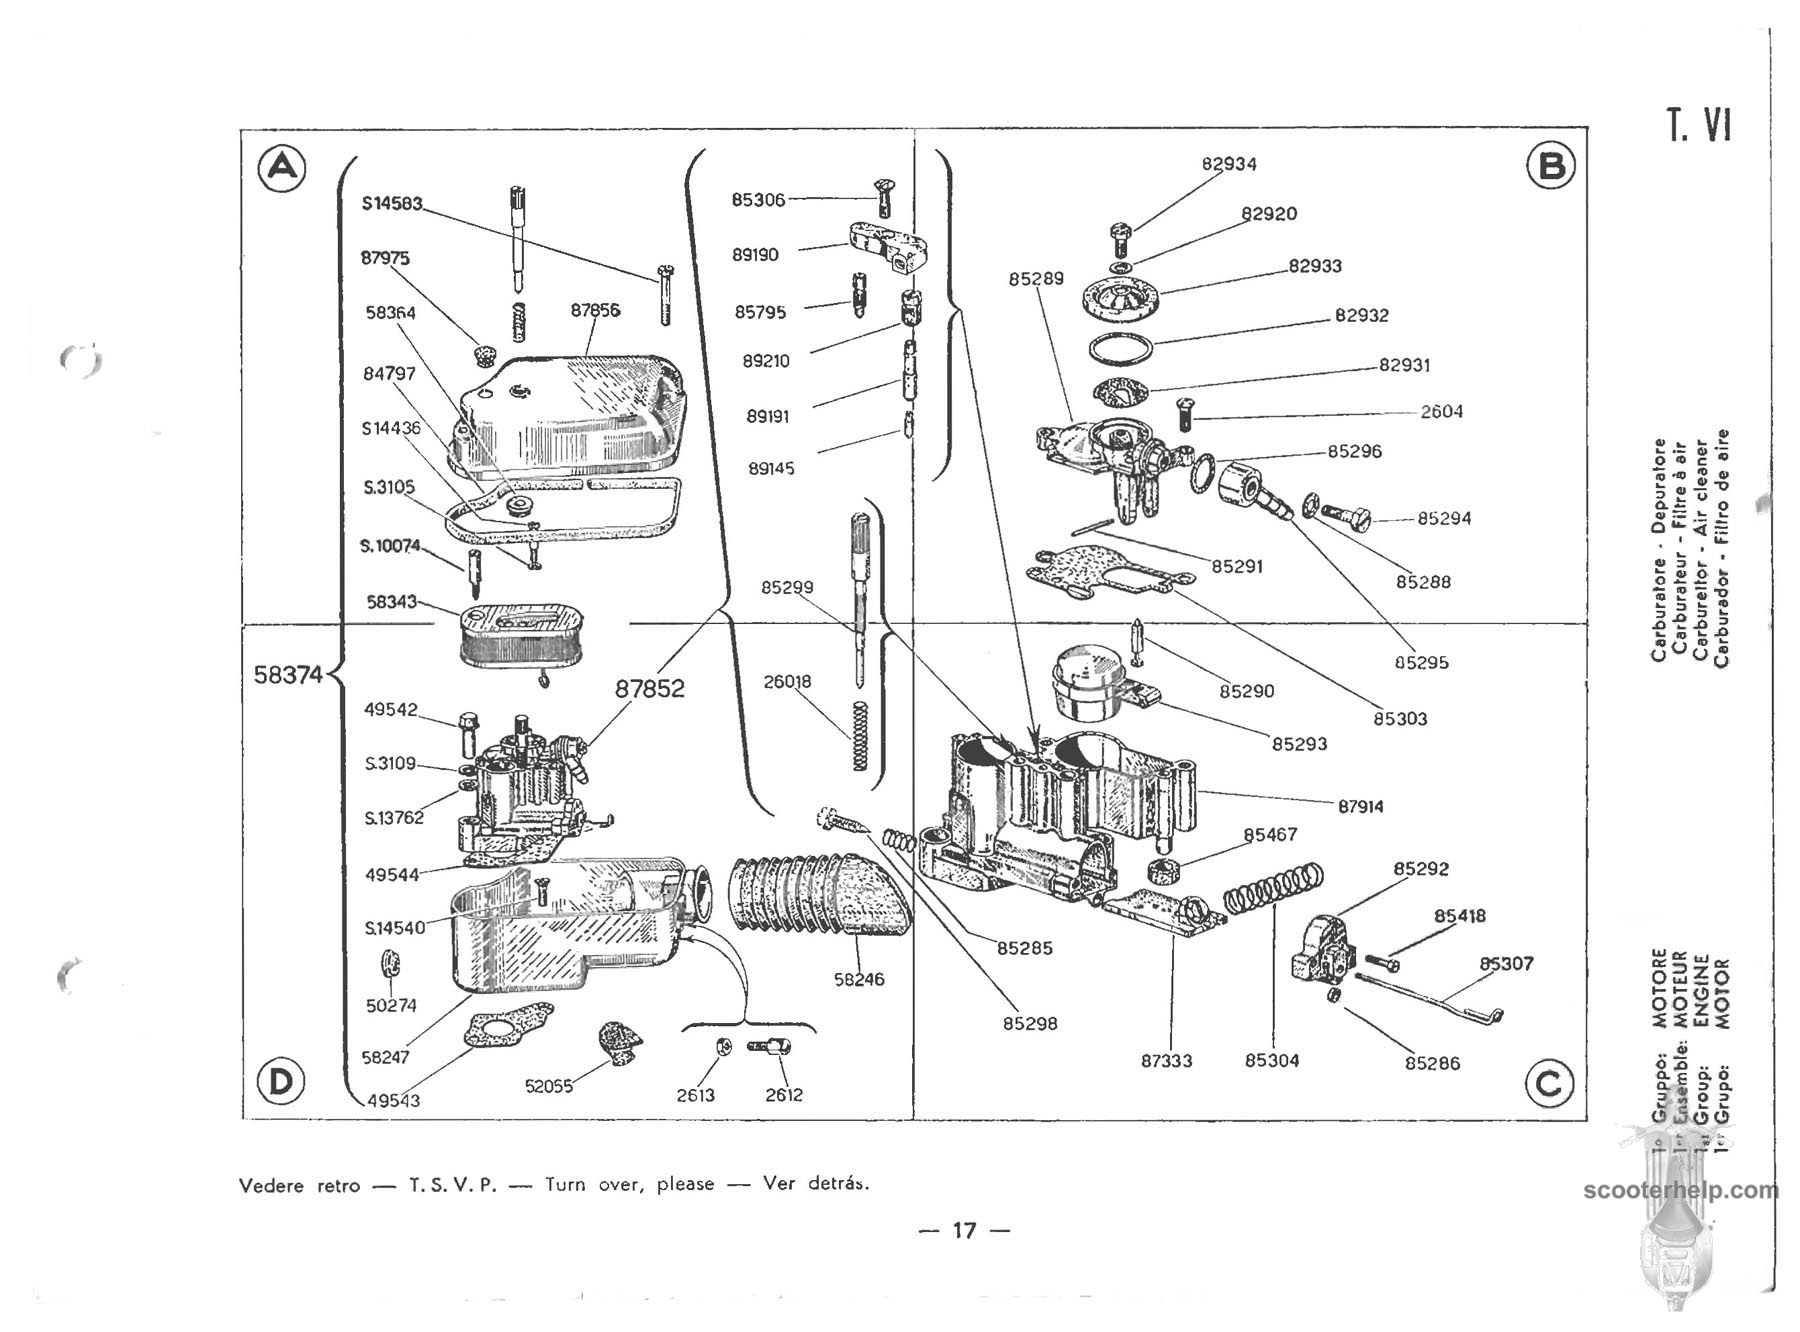 Vespa 150 Vbb1t Parts Manual Vba Wiring Diagram Or Click Here For A 101mb Pdf File